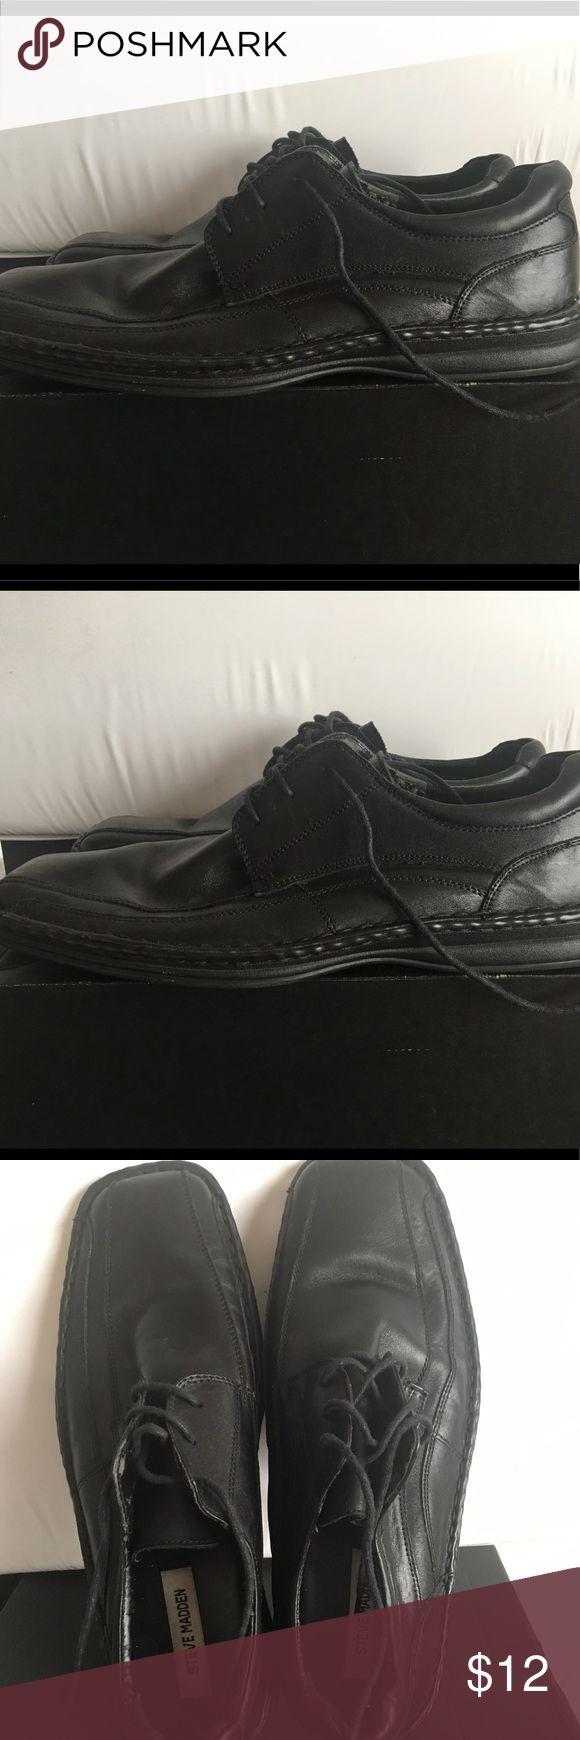 Steve Madden Men's Black Leather Oxford 11 Shoes Steve Madden Men's Black Leather Oxford Lace-up Casual Size 11 Shoes Steve Madden Shoes Oxfords & Derbys